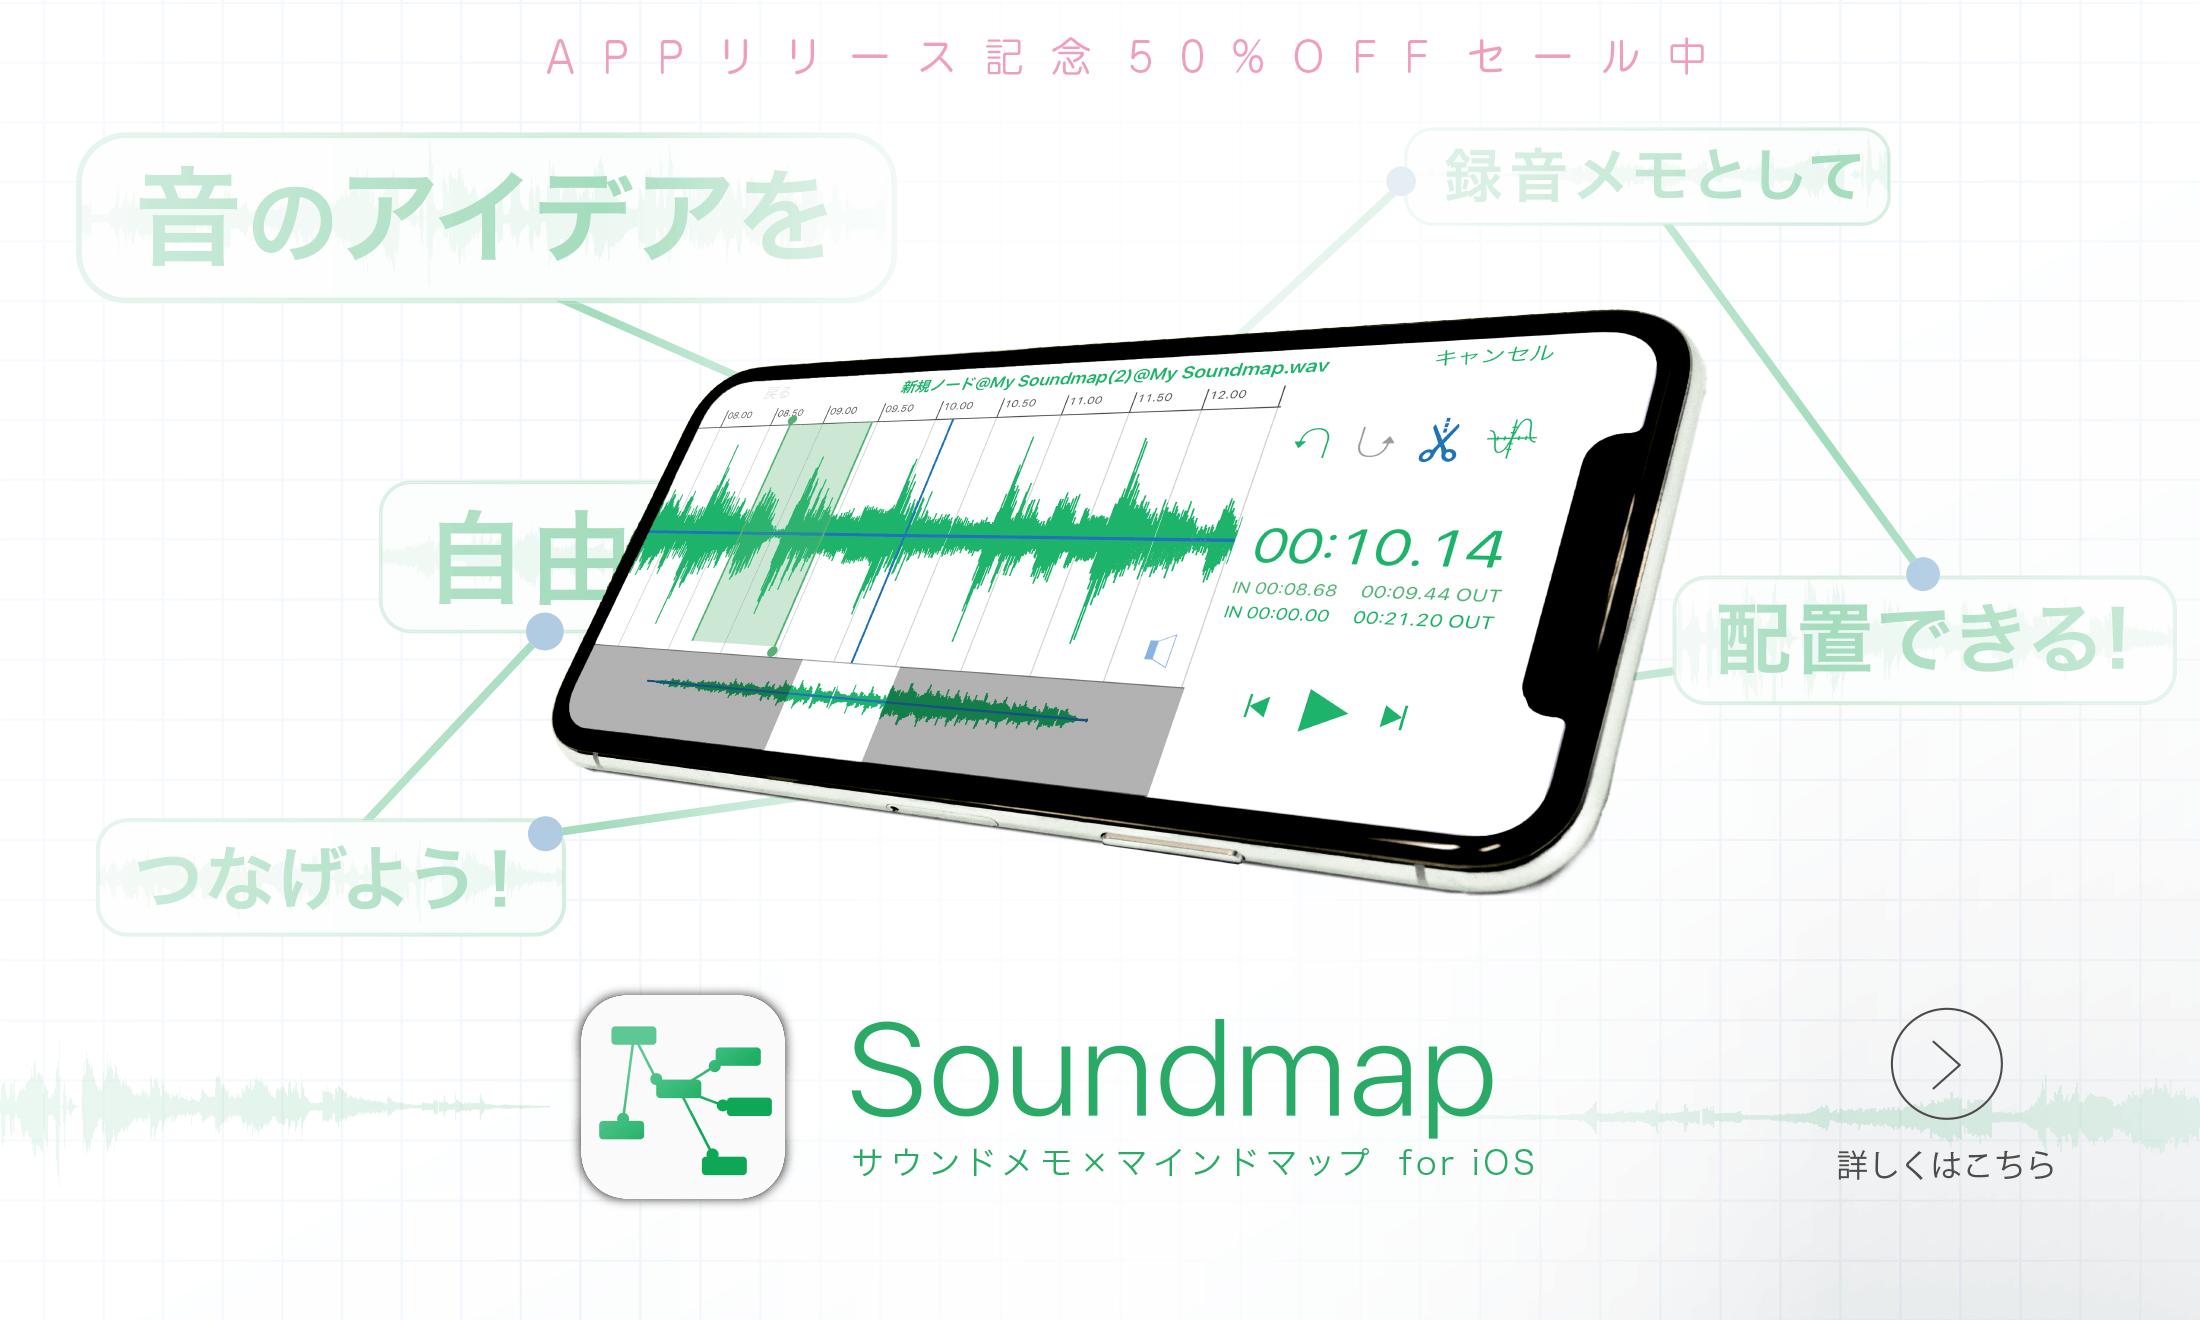 Soundmap